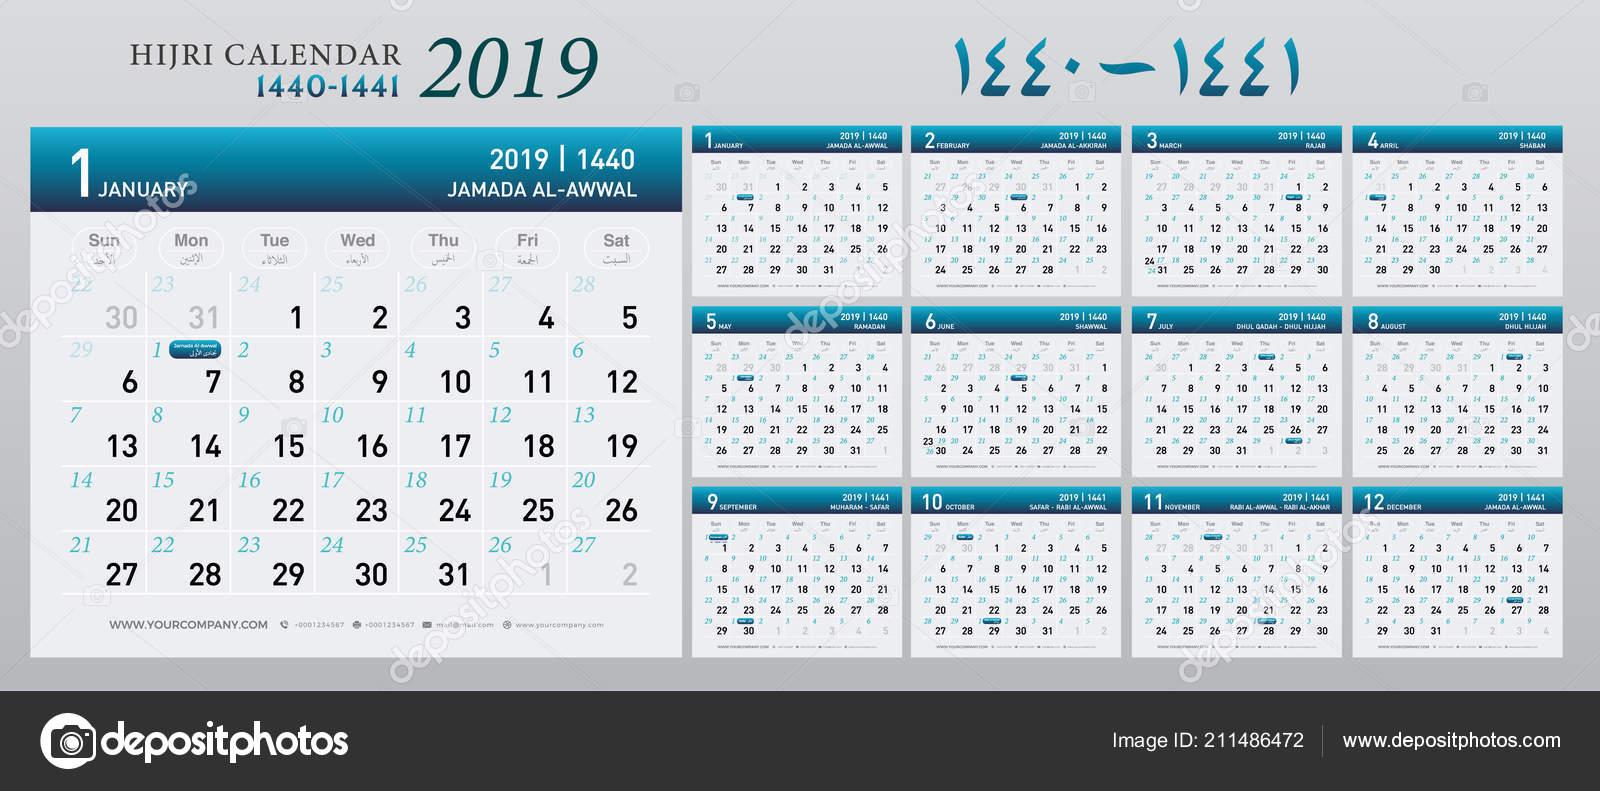 Calendrier Hegirien 1439.Calendrier 2019 Hijri 1440 1441 Modele Islamique Simple